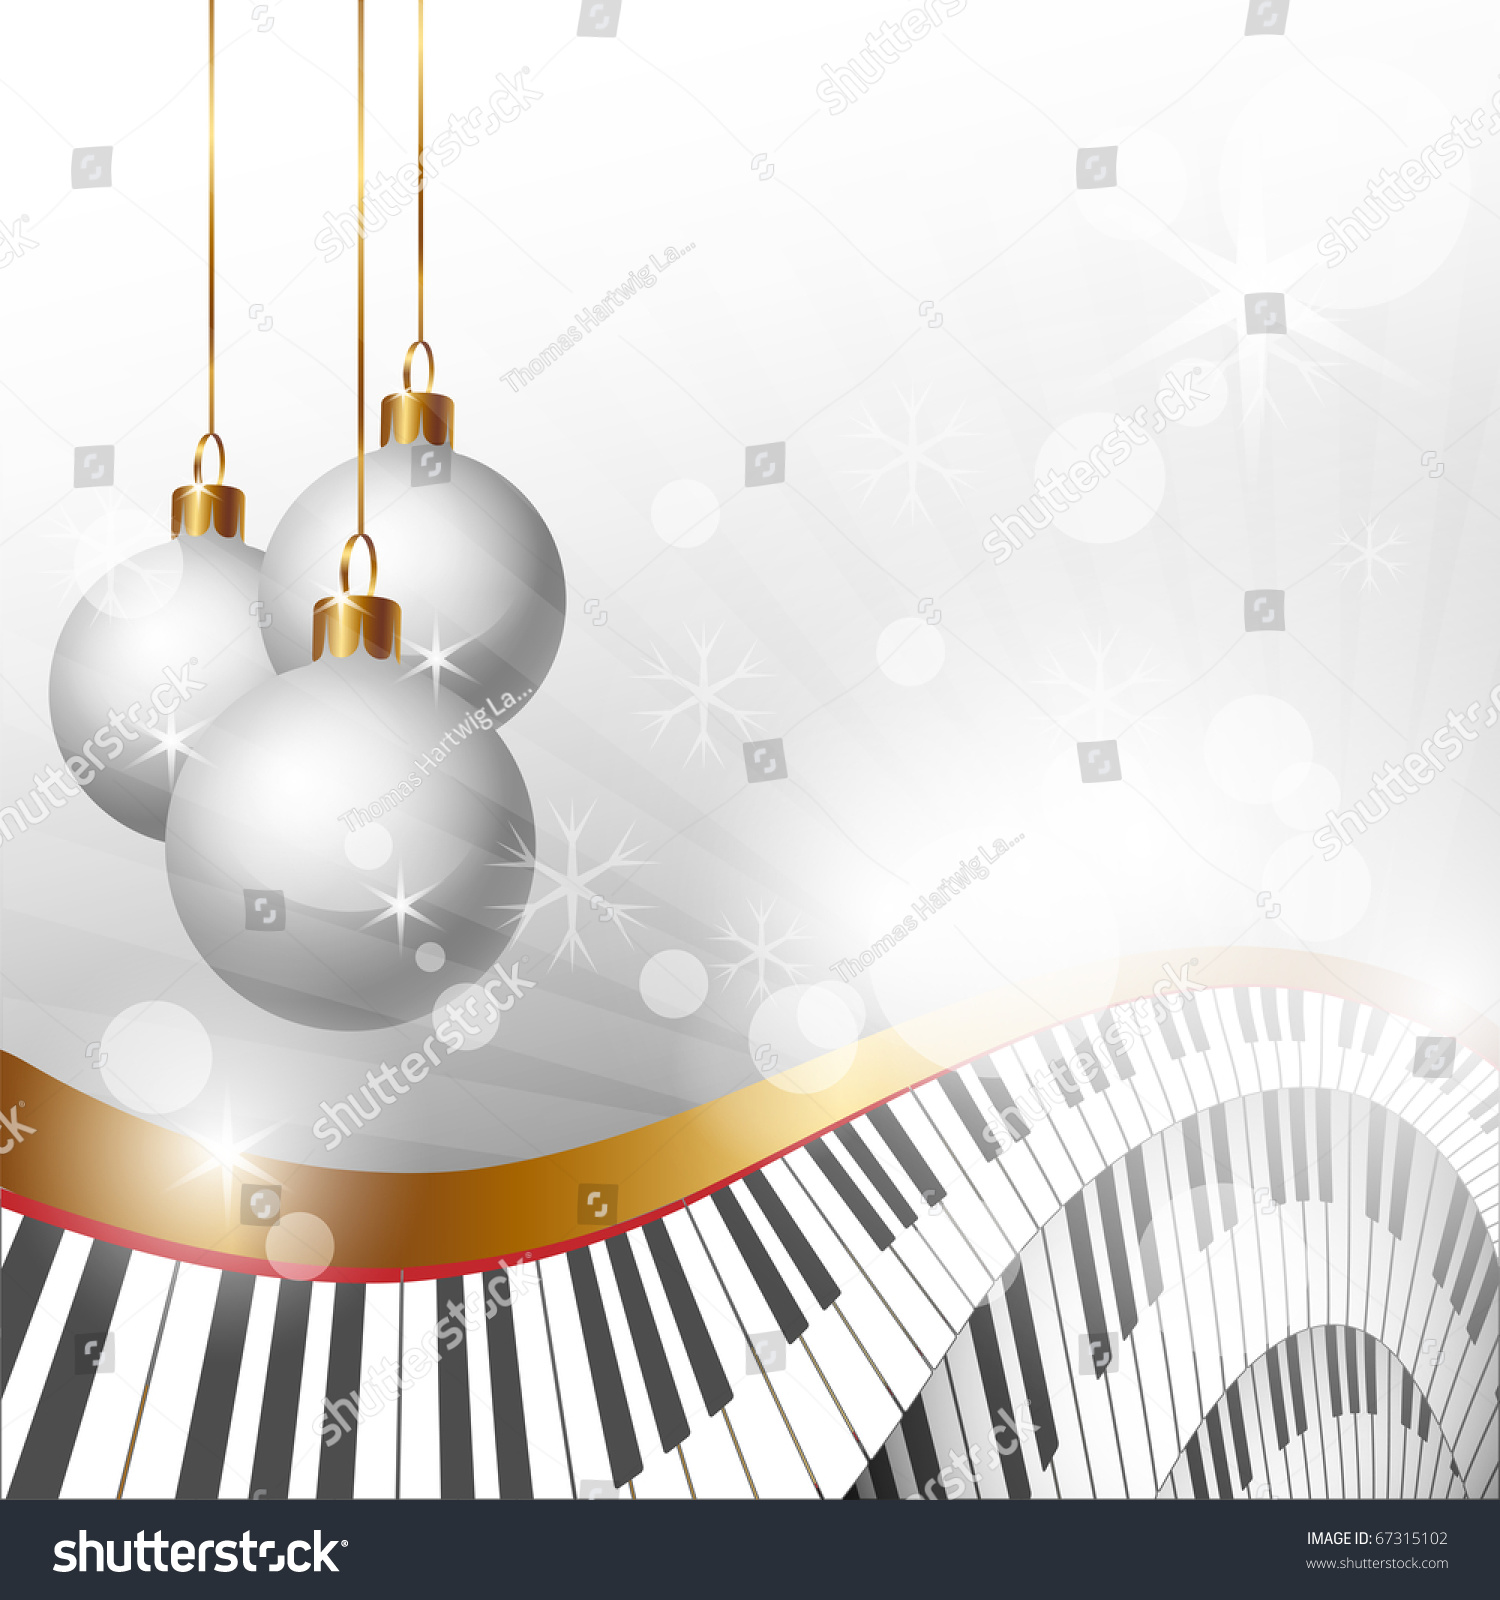 Christmas Music Background.Magic Christmas Music Background Clip Art Stock Illustration